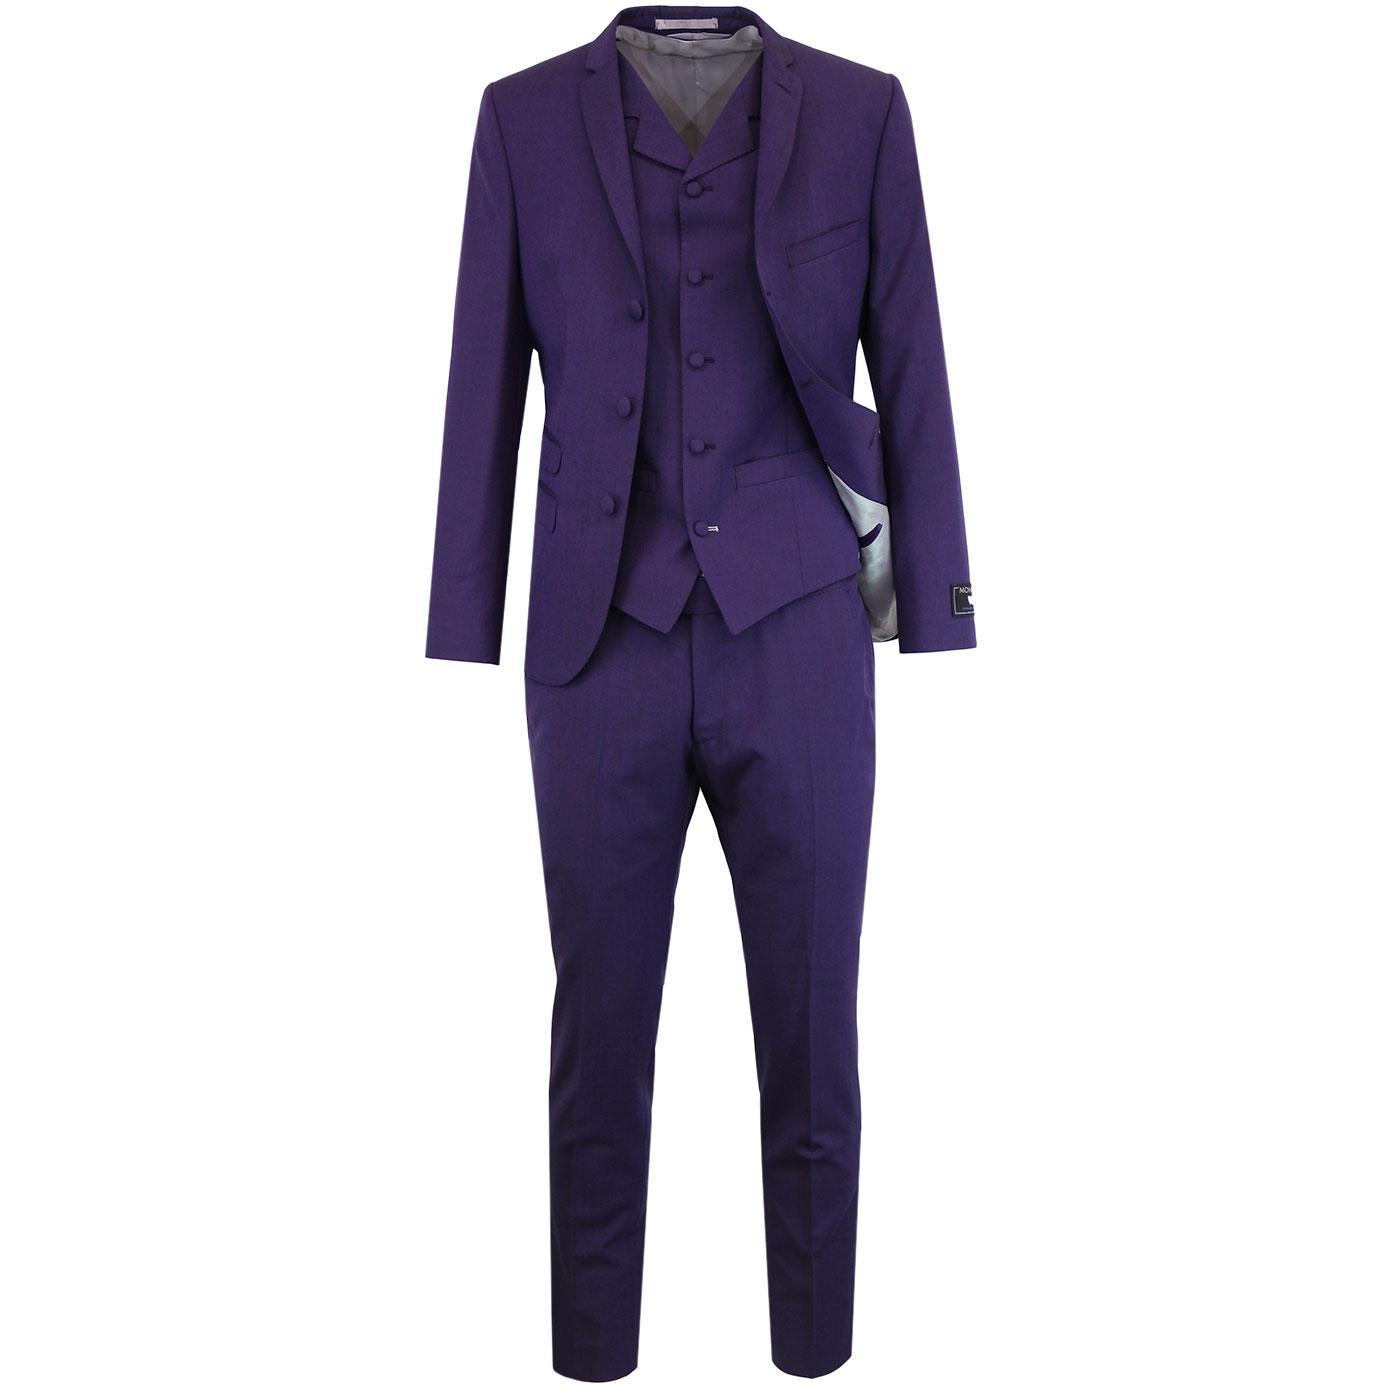 MADCAP ENGLAND 60s Mod Mohair Tonic Suit in Purple